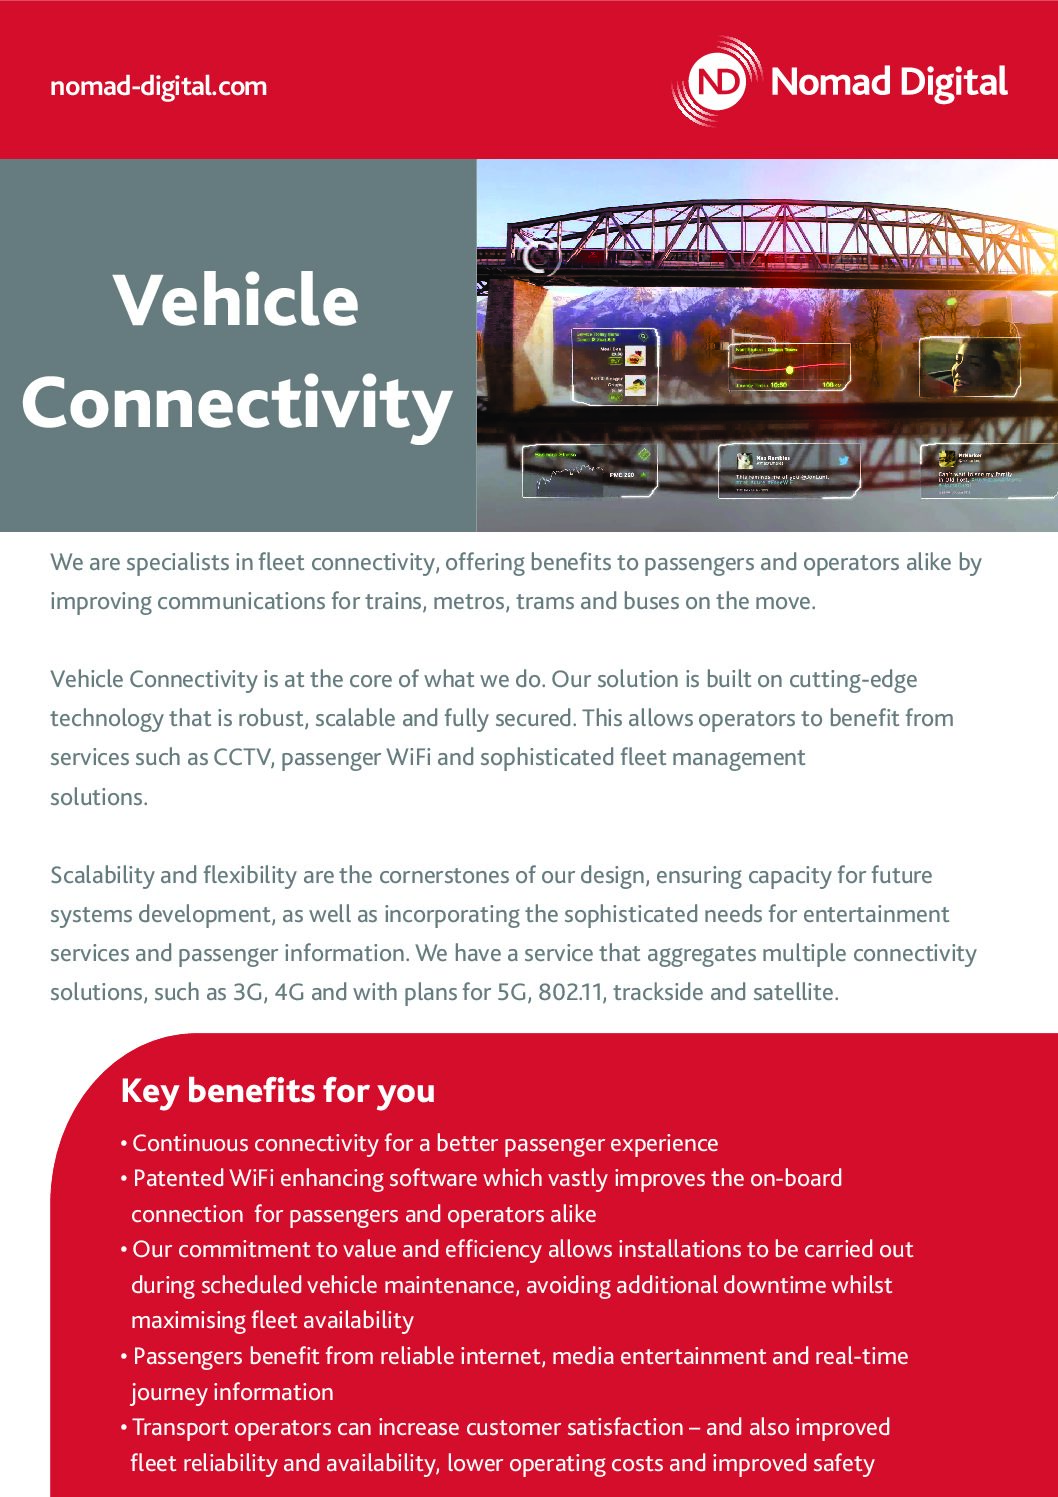 Vehicle Connectivity